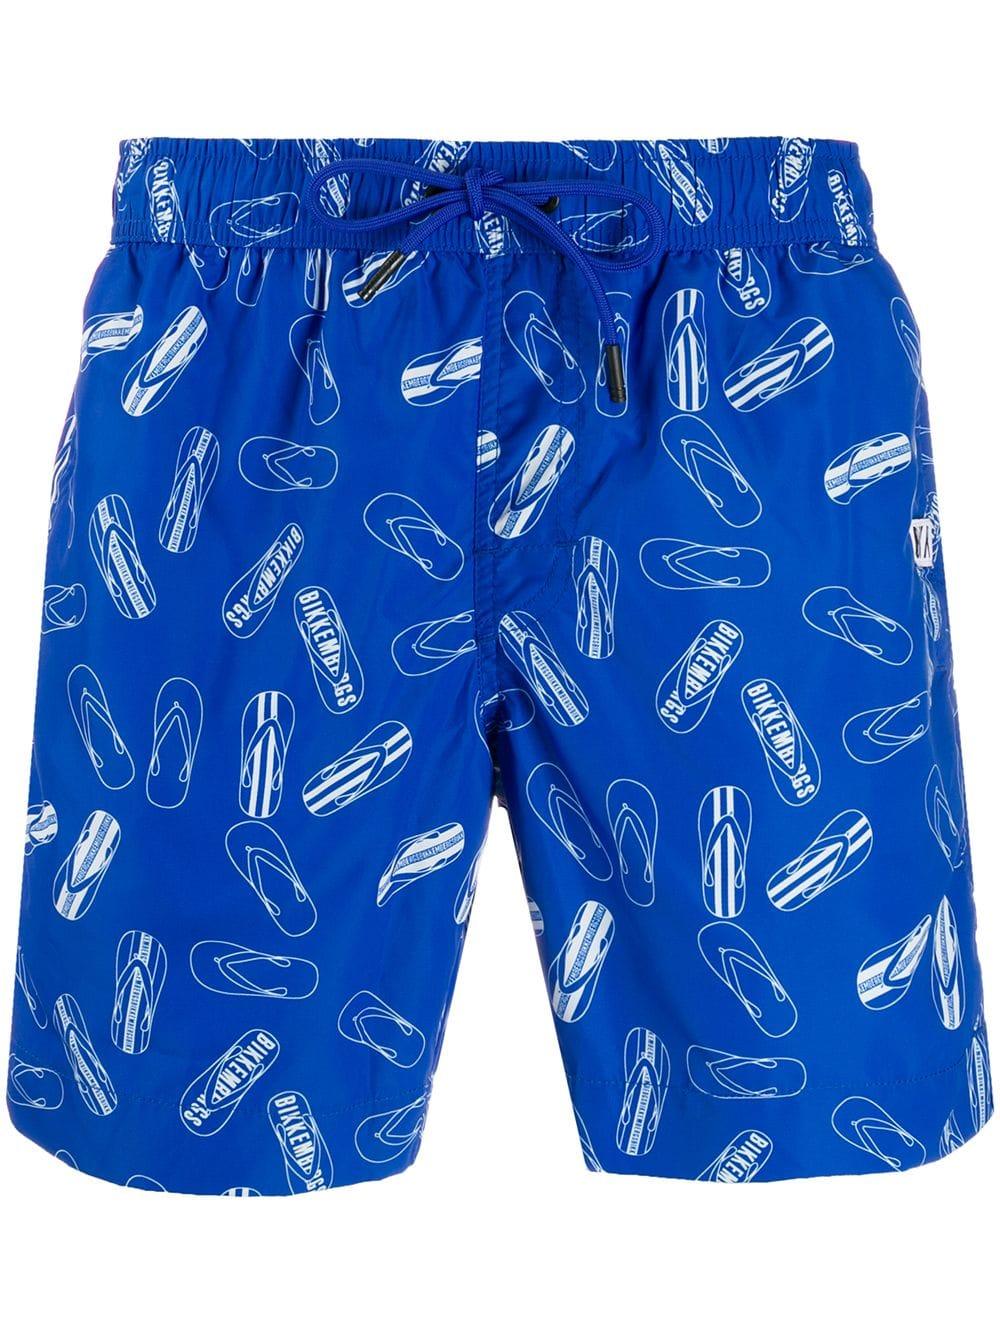 2fd987938f761d DIRK BIKKEMBERGS DIRK BIKKEMBERGS FLIP FLOPS PRINT SWIM SHORTS - BLUE.  #dirkbikkembergs #cloth